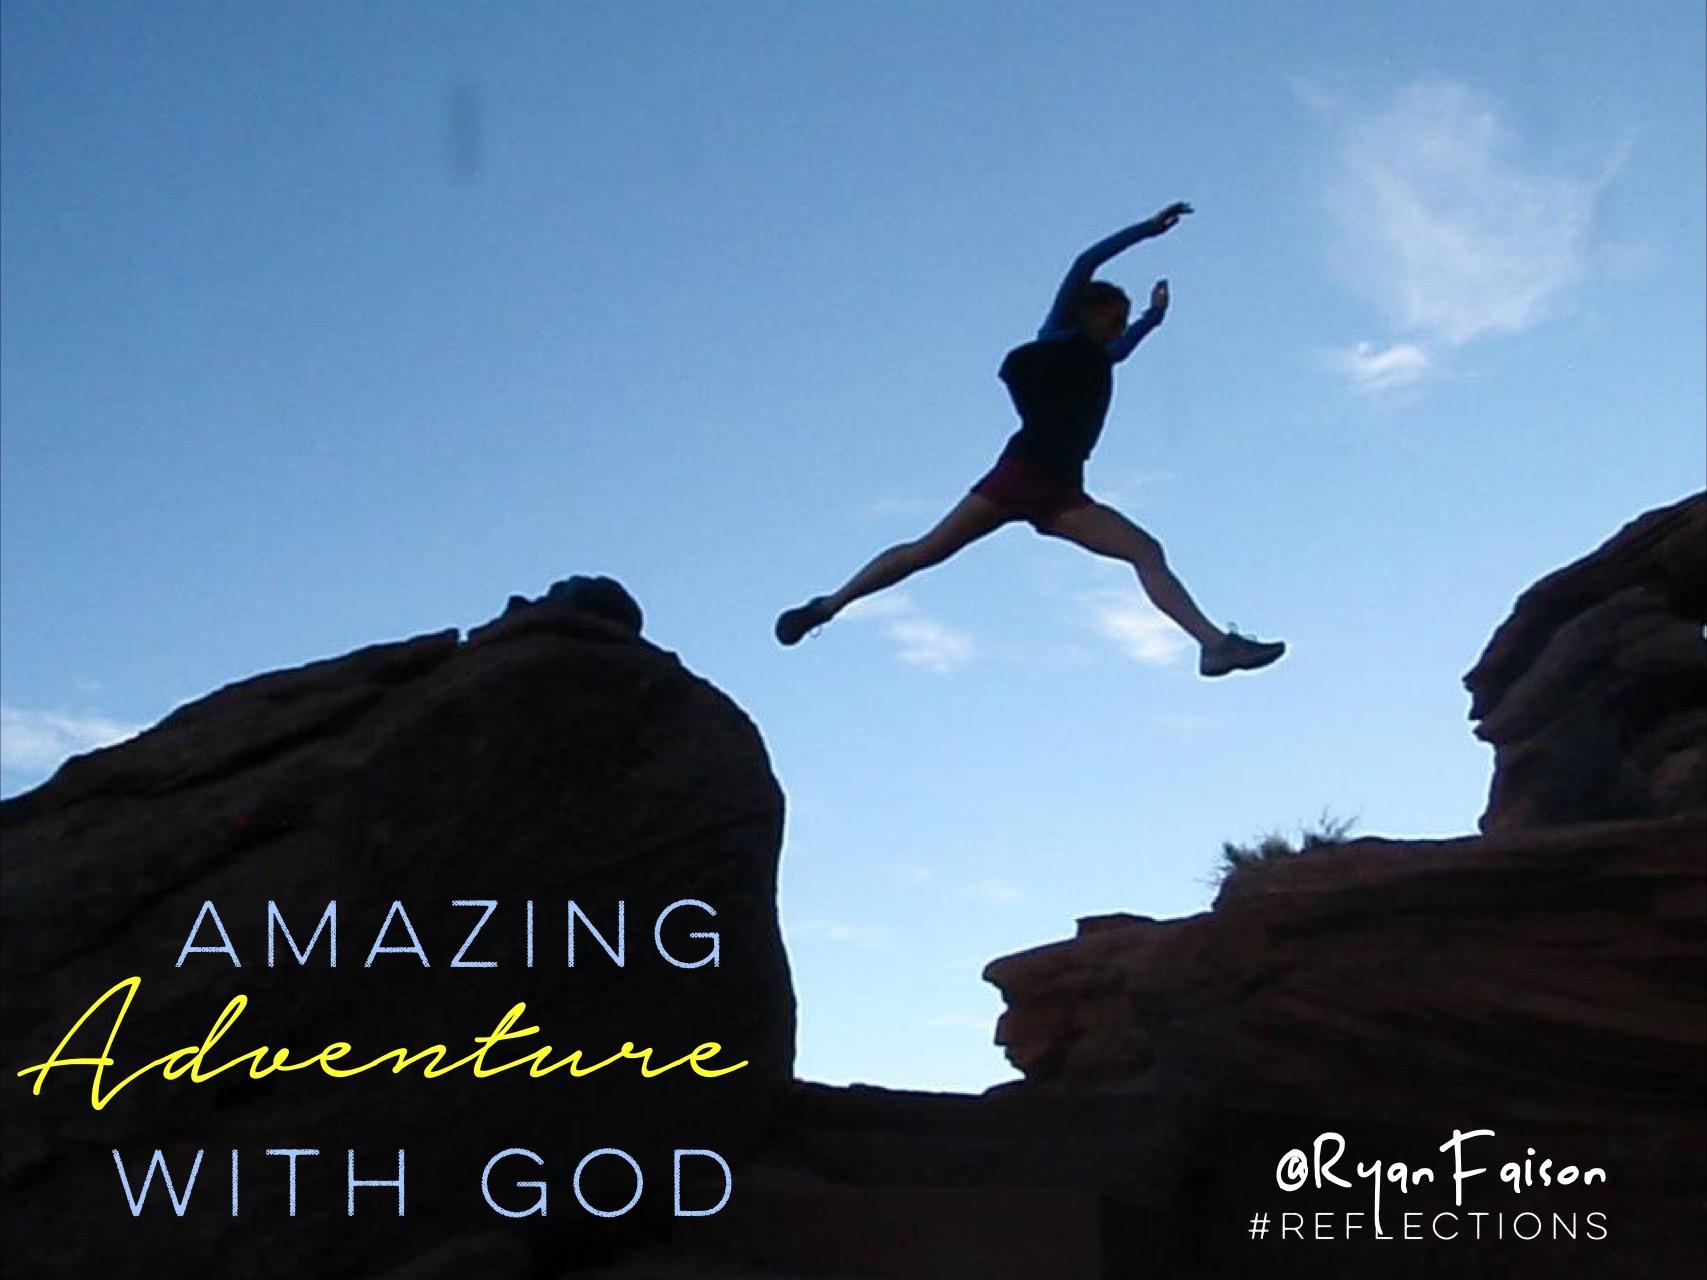 AmazingAdventure